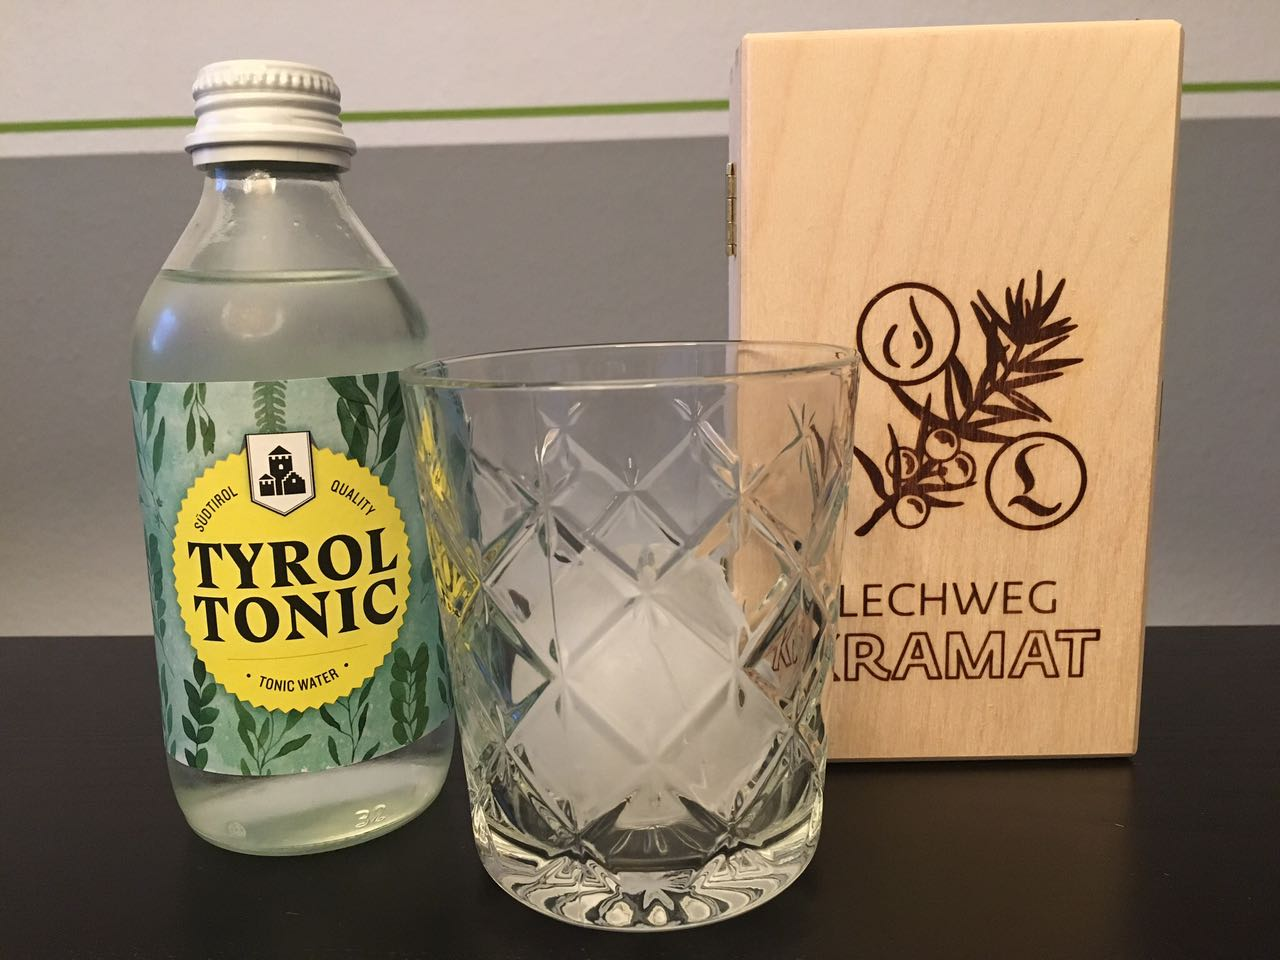 Lechtal Holzbox und Tyrol Tonic